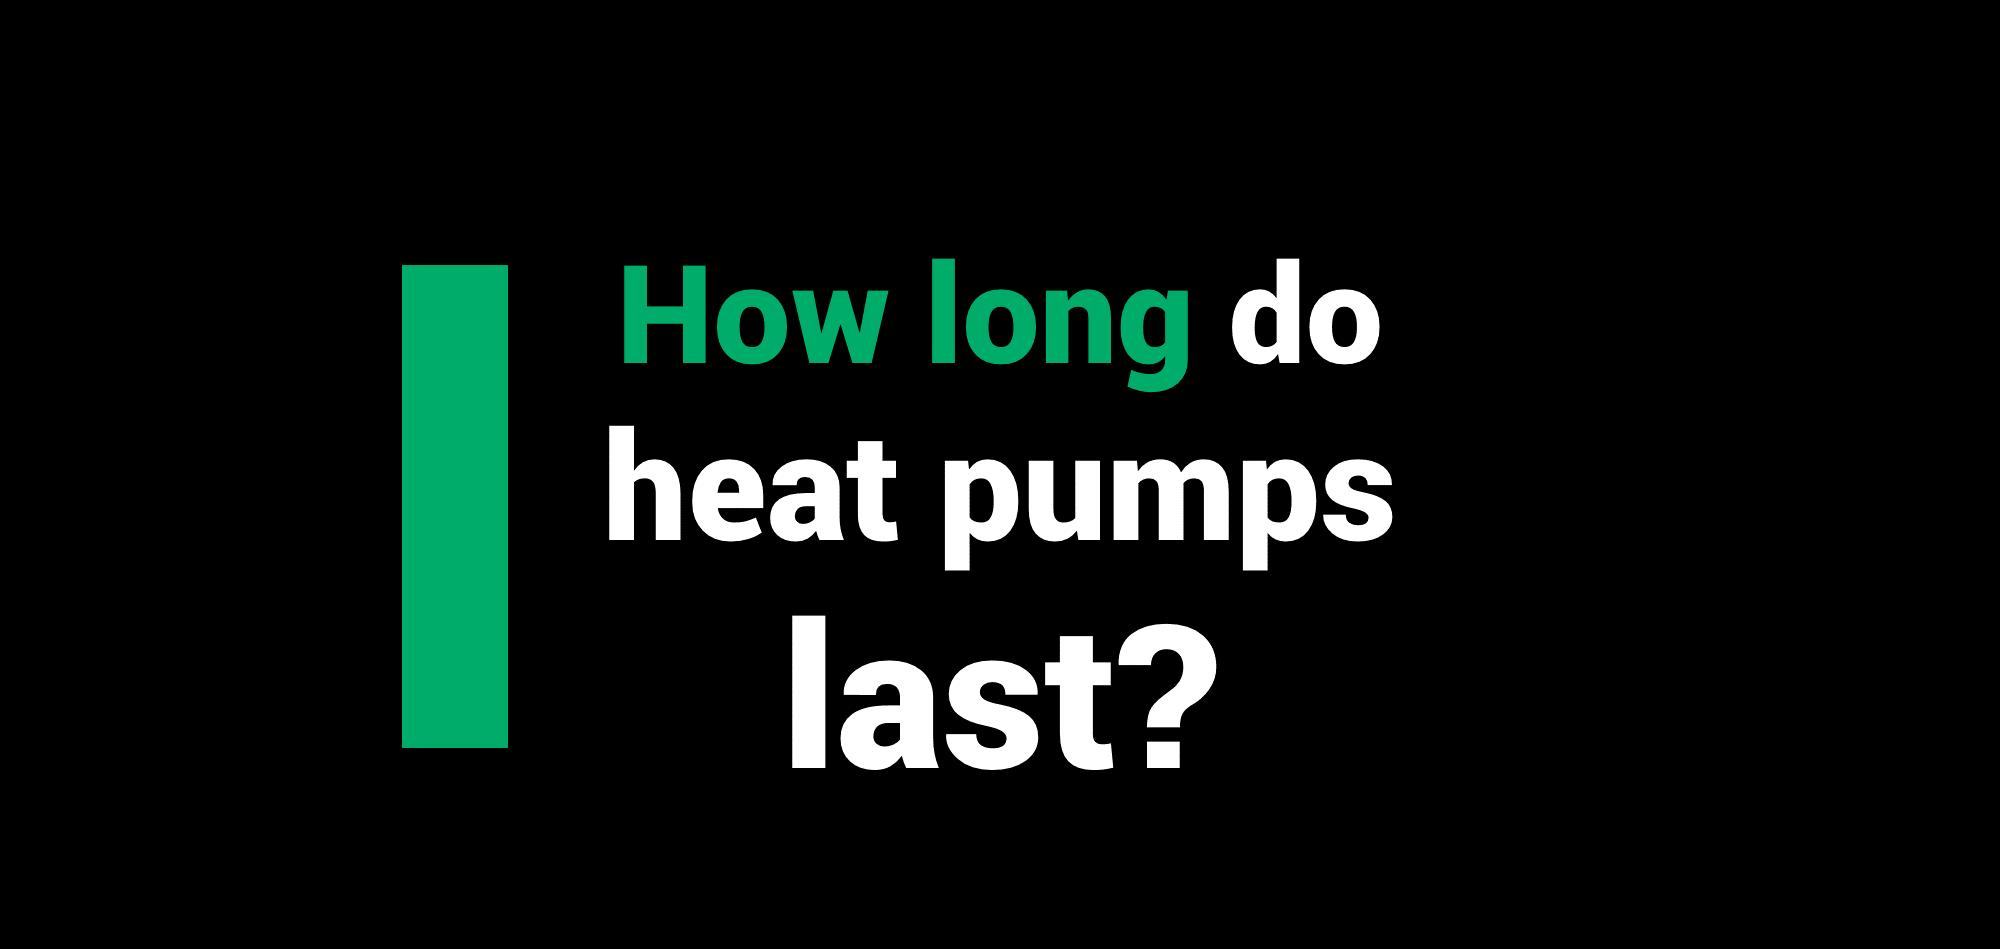 life expectancy of heat pumps